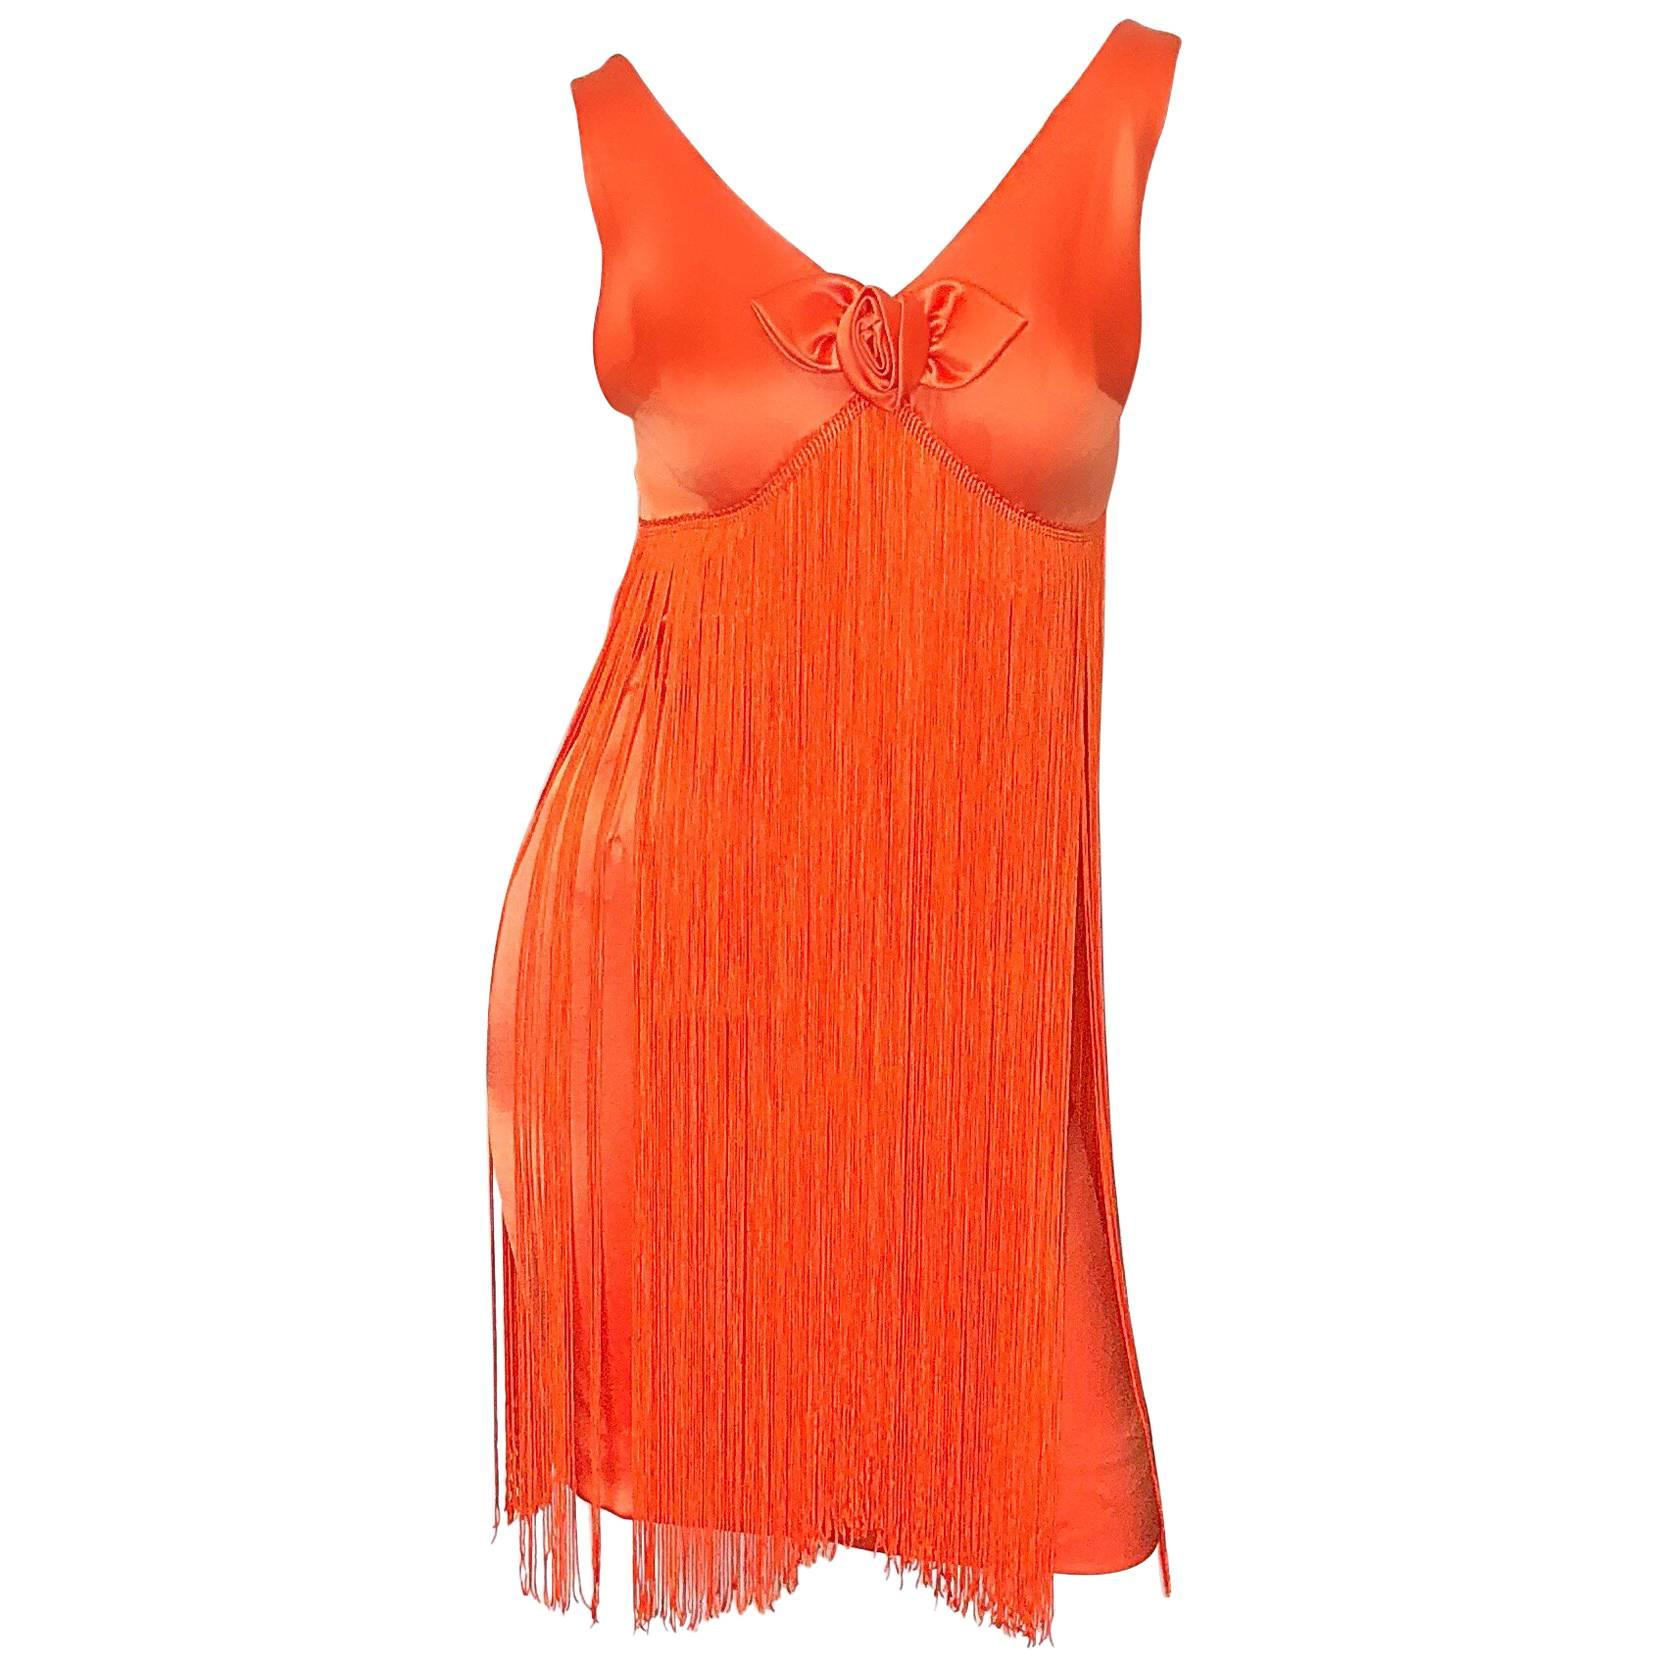 Joseph Magnin 1960s Amazing Bright Orange Fully Fringe Flapper Jersey 60s Dress